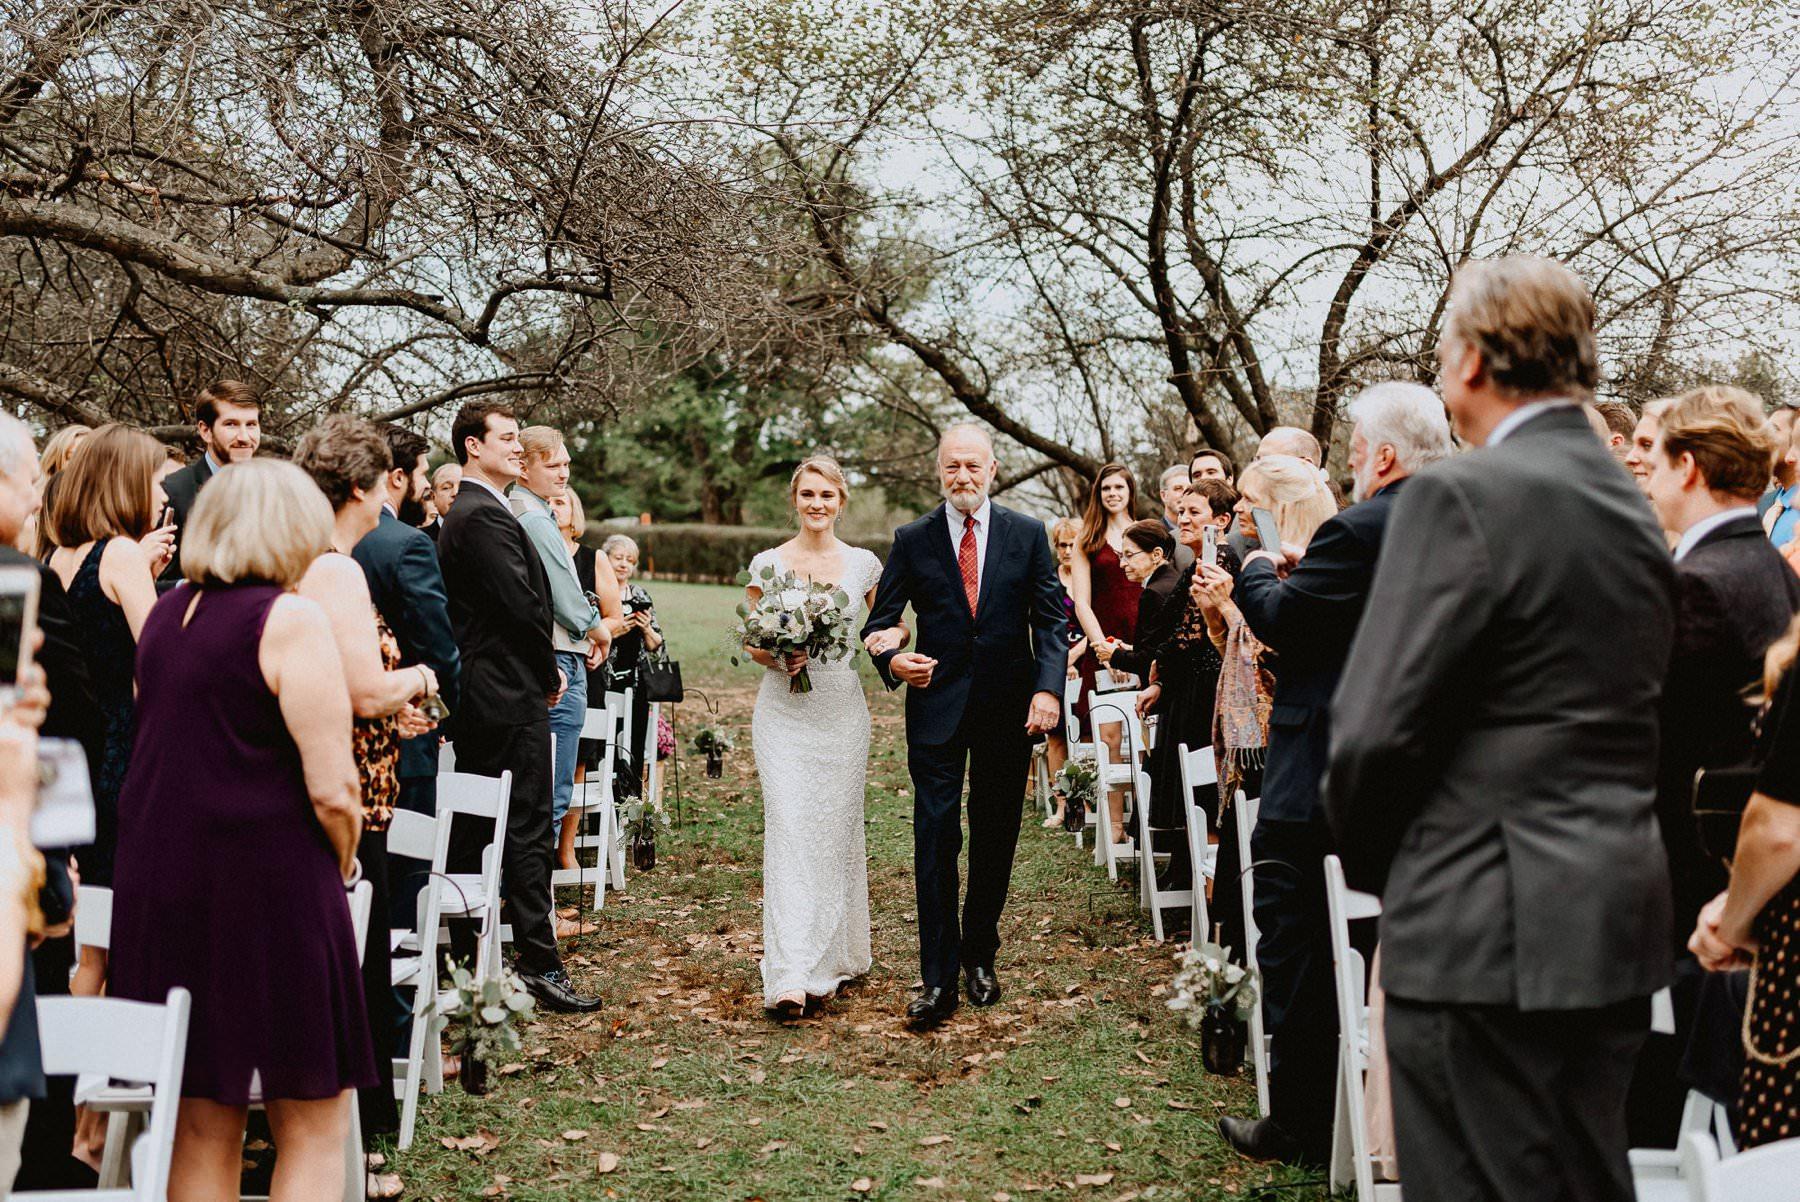 John_James_Audubon_Center_wedding-41.jpg